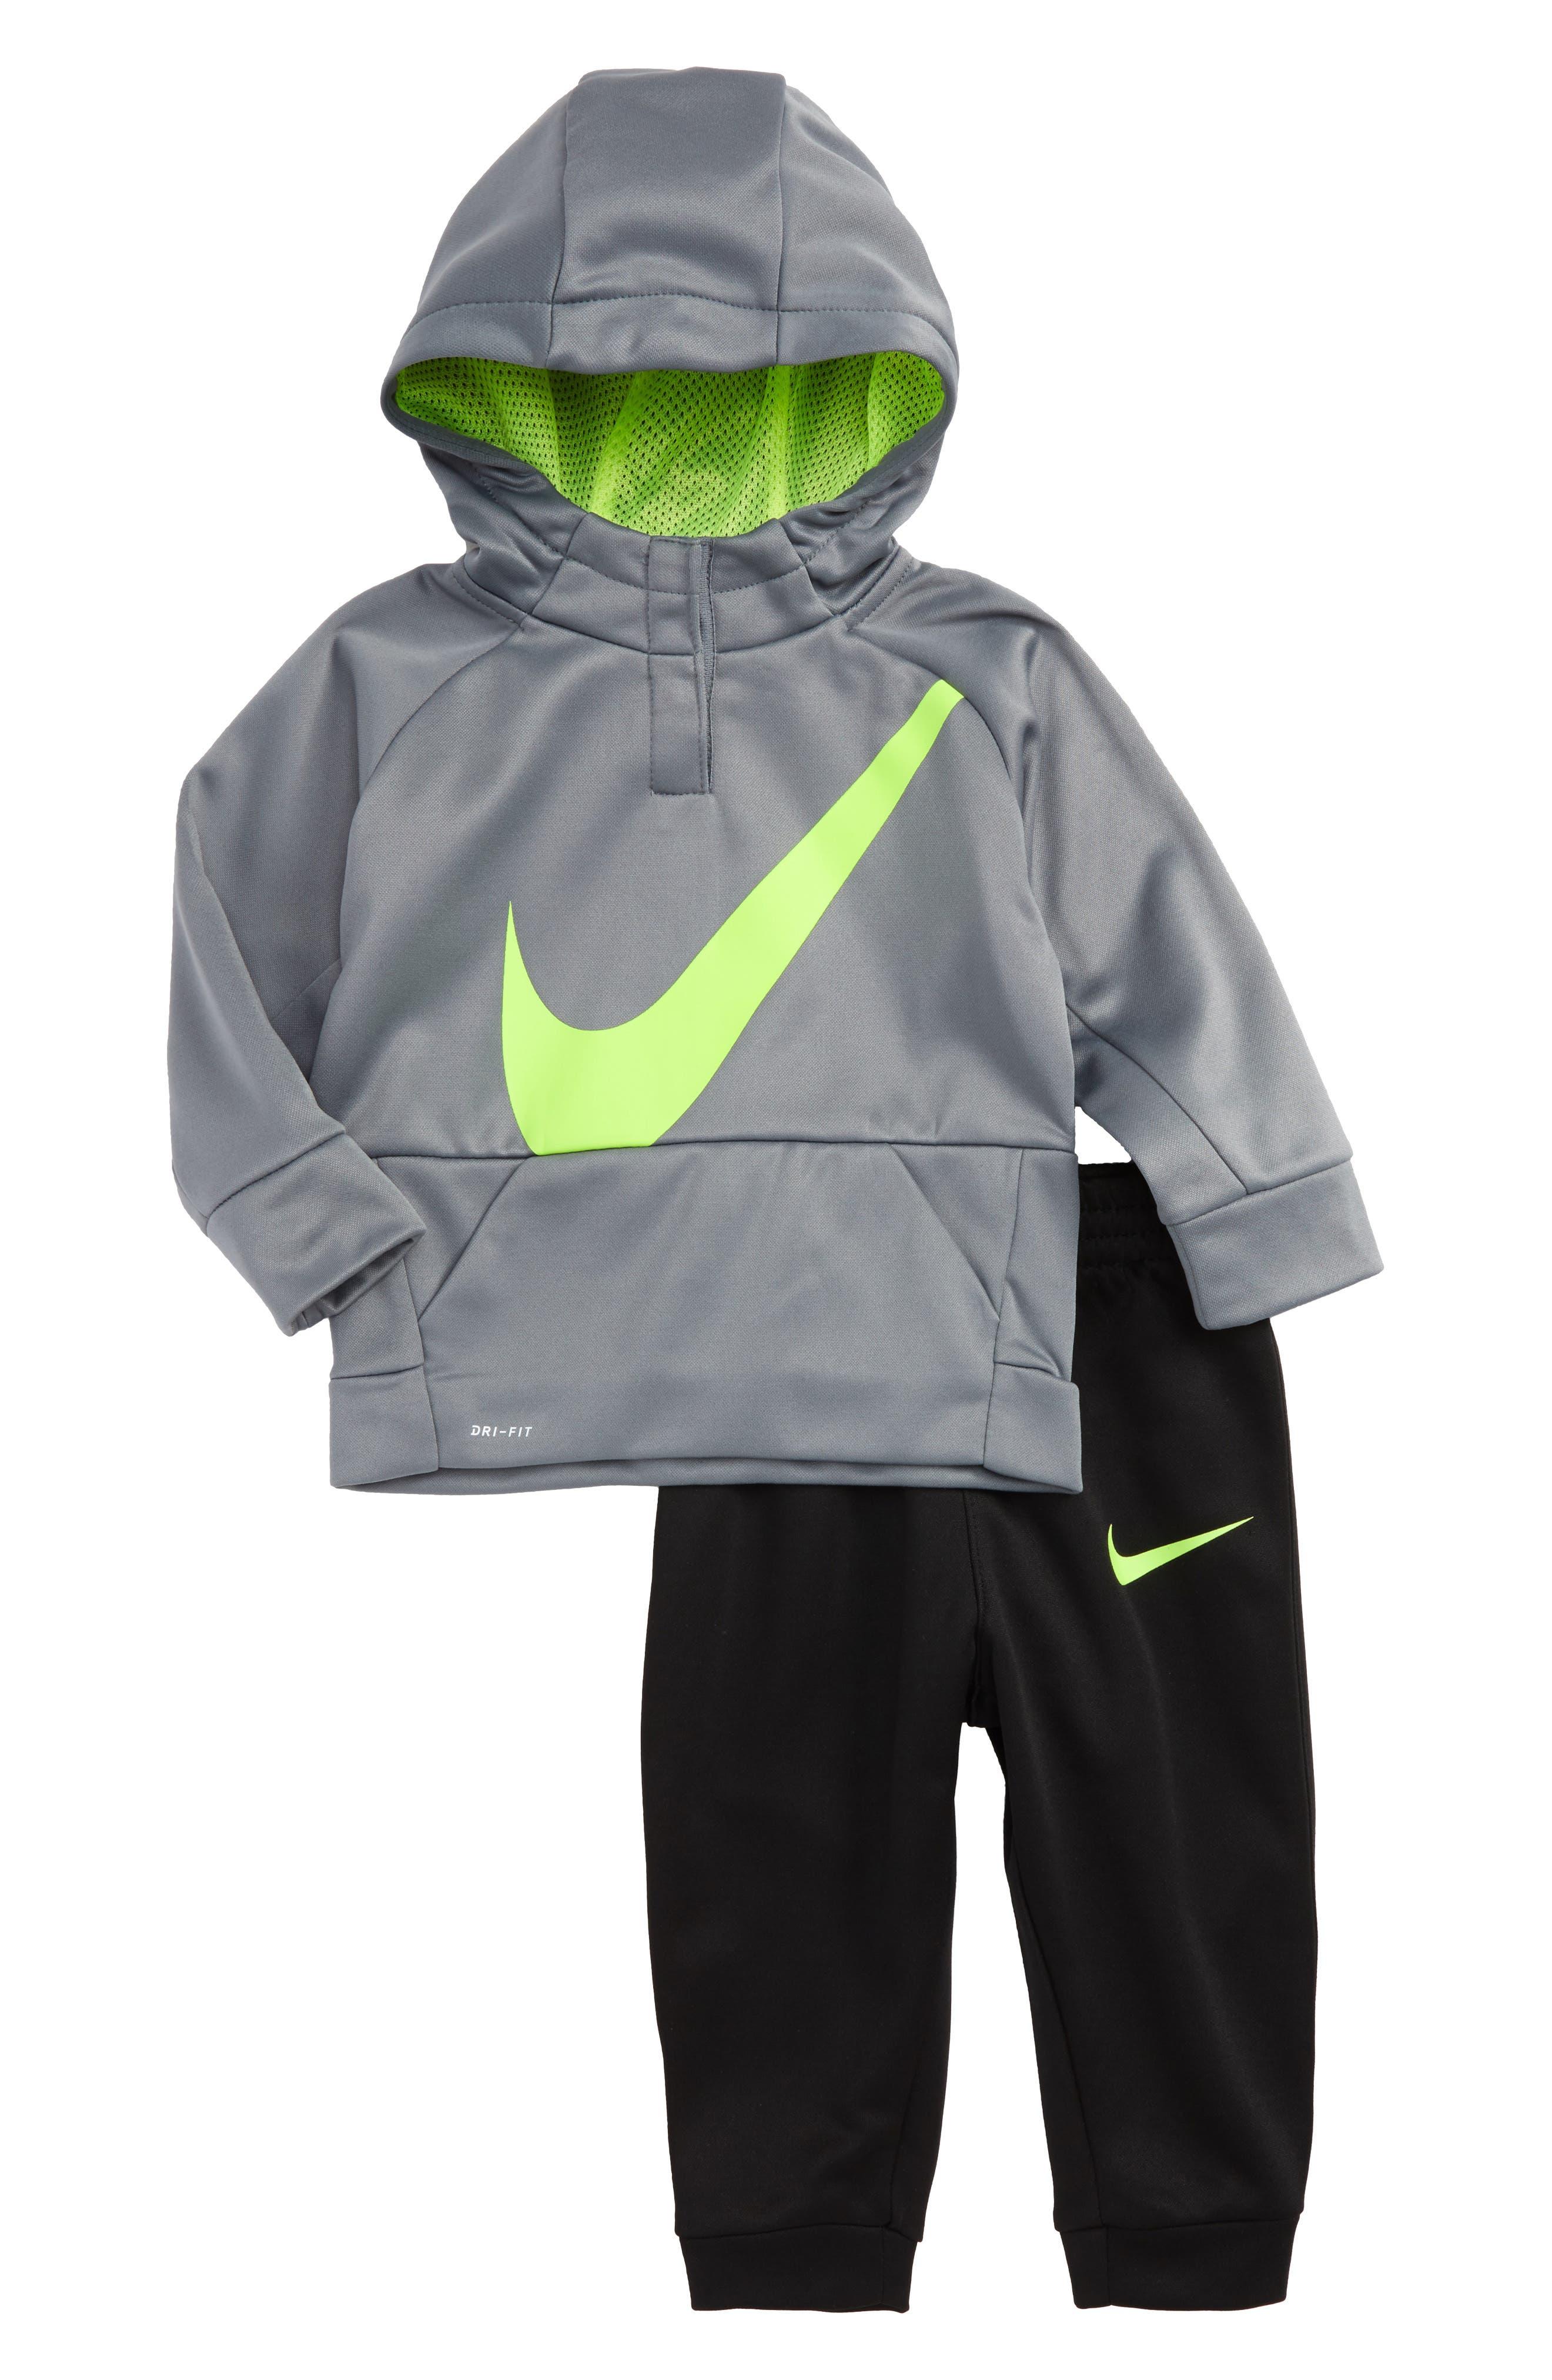 Alternate Image 1 Selected - Nike Swoosh Therma-FIT Oversize Hoodie & Pants Set (Baby Boys)